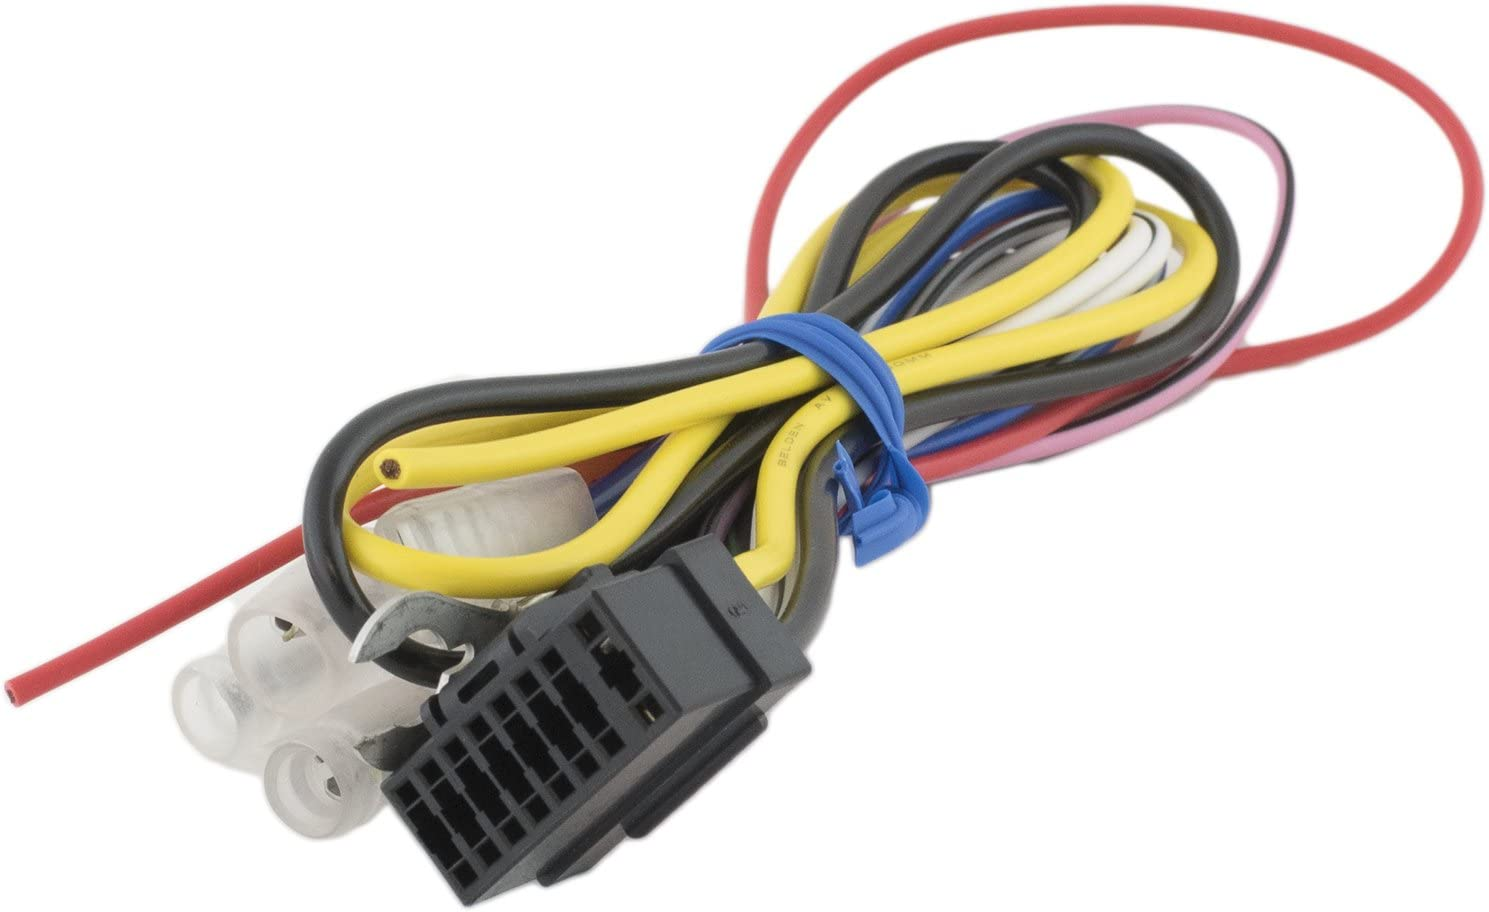 Xtenzi Wire Harness Plug 16 Pin Car Stereo for Alpine CDE-164BT CDE-W265BT